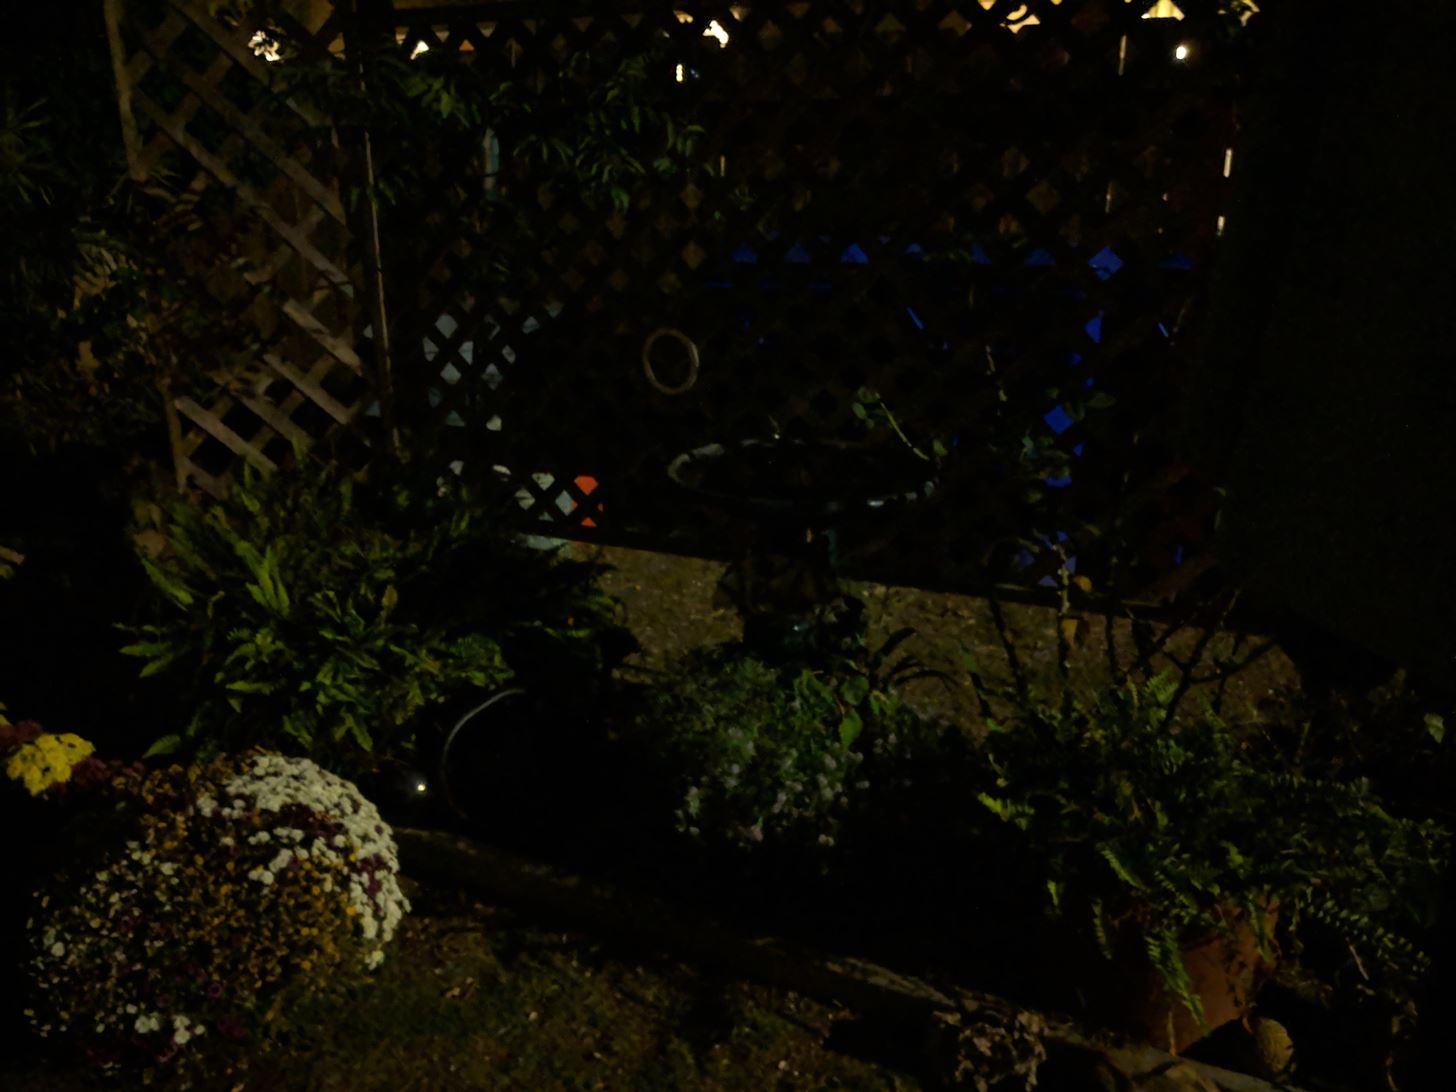 Google's Night Sight Camera Is Downright Amazing